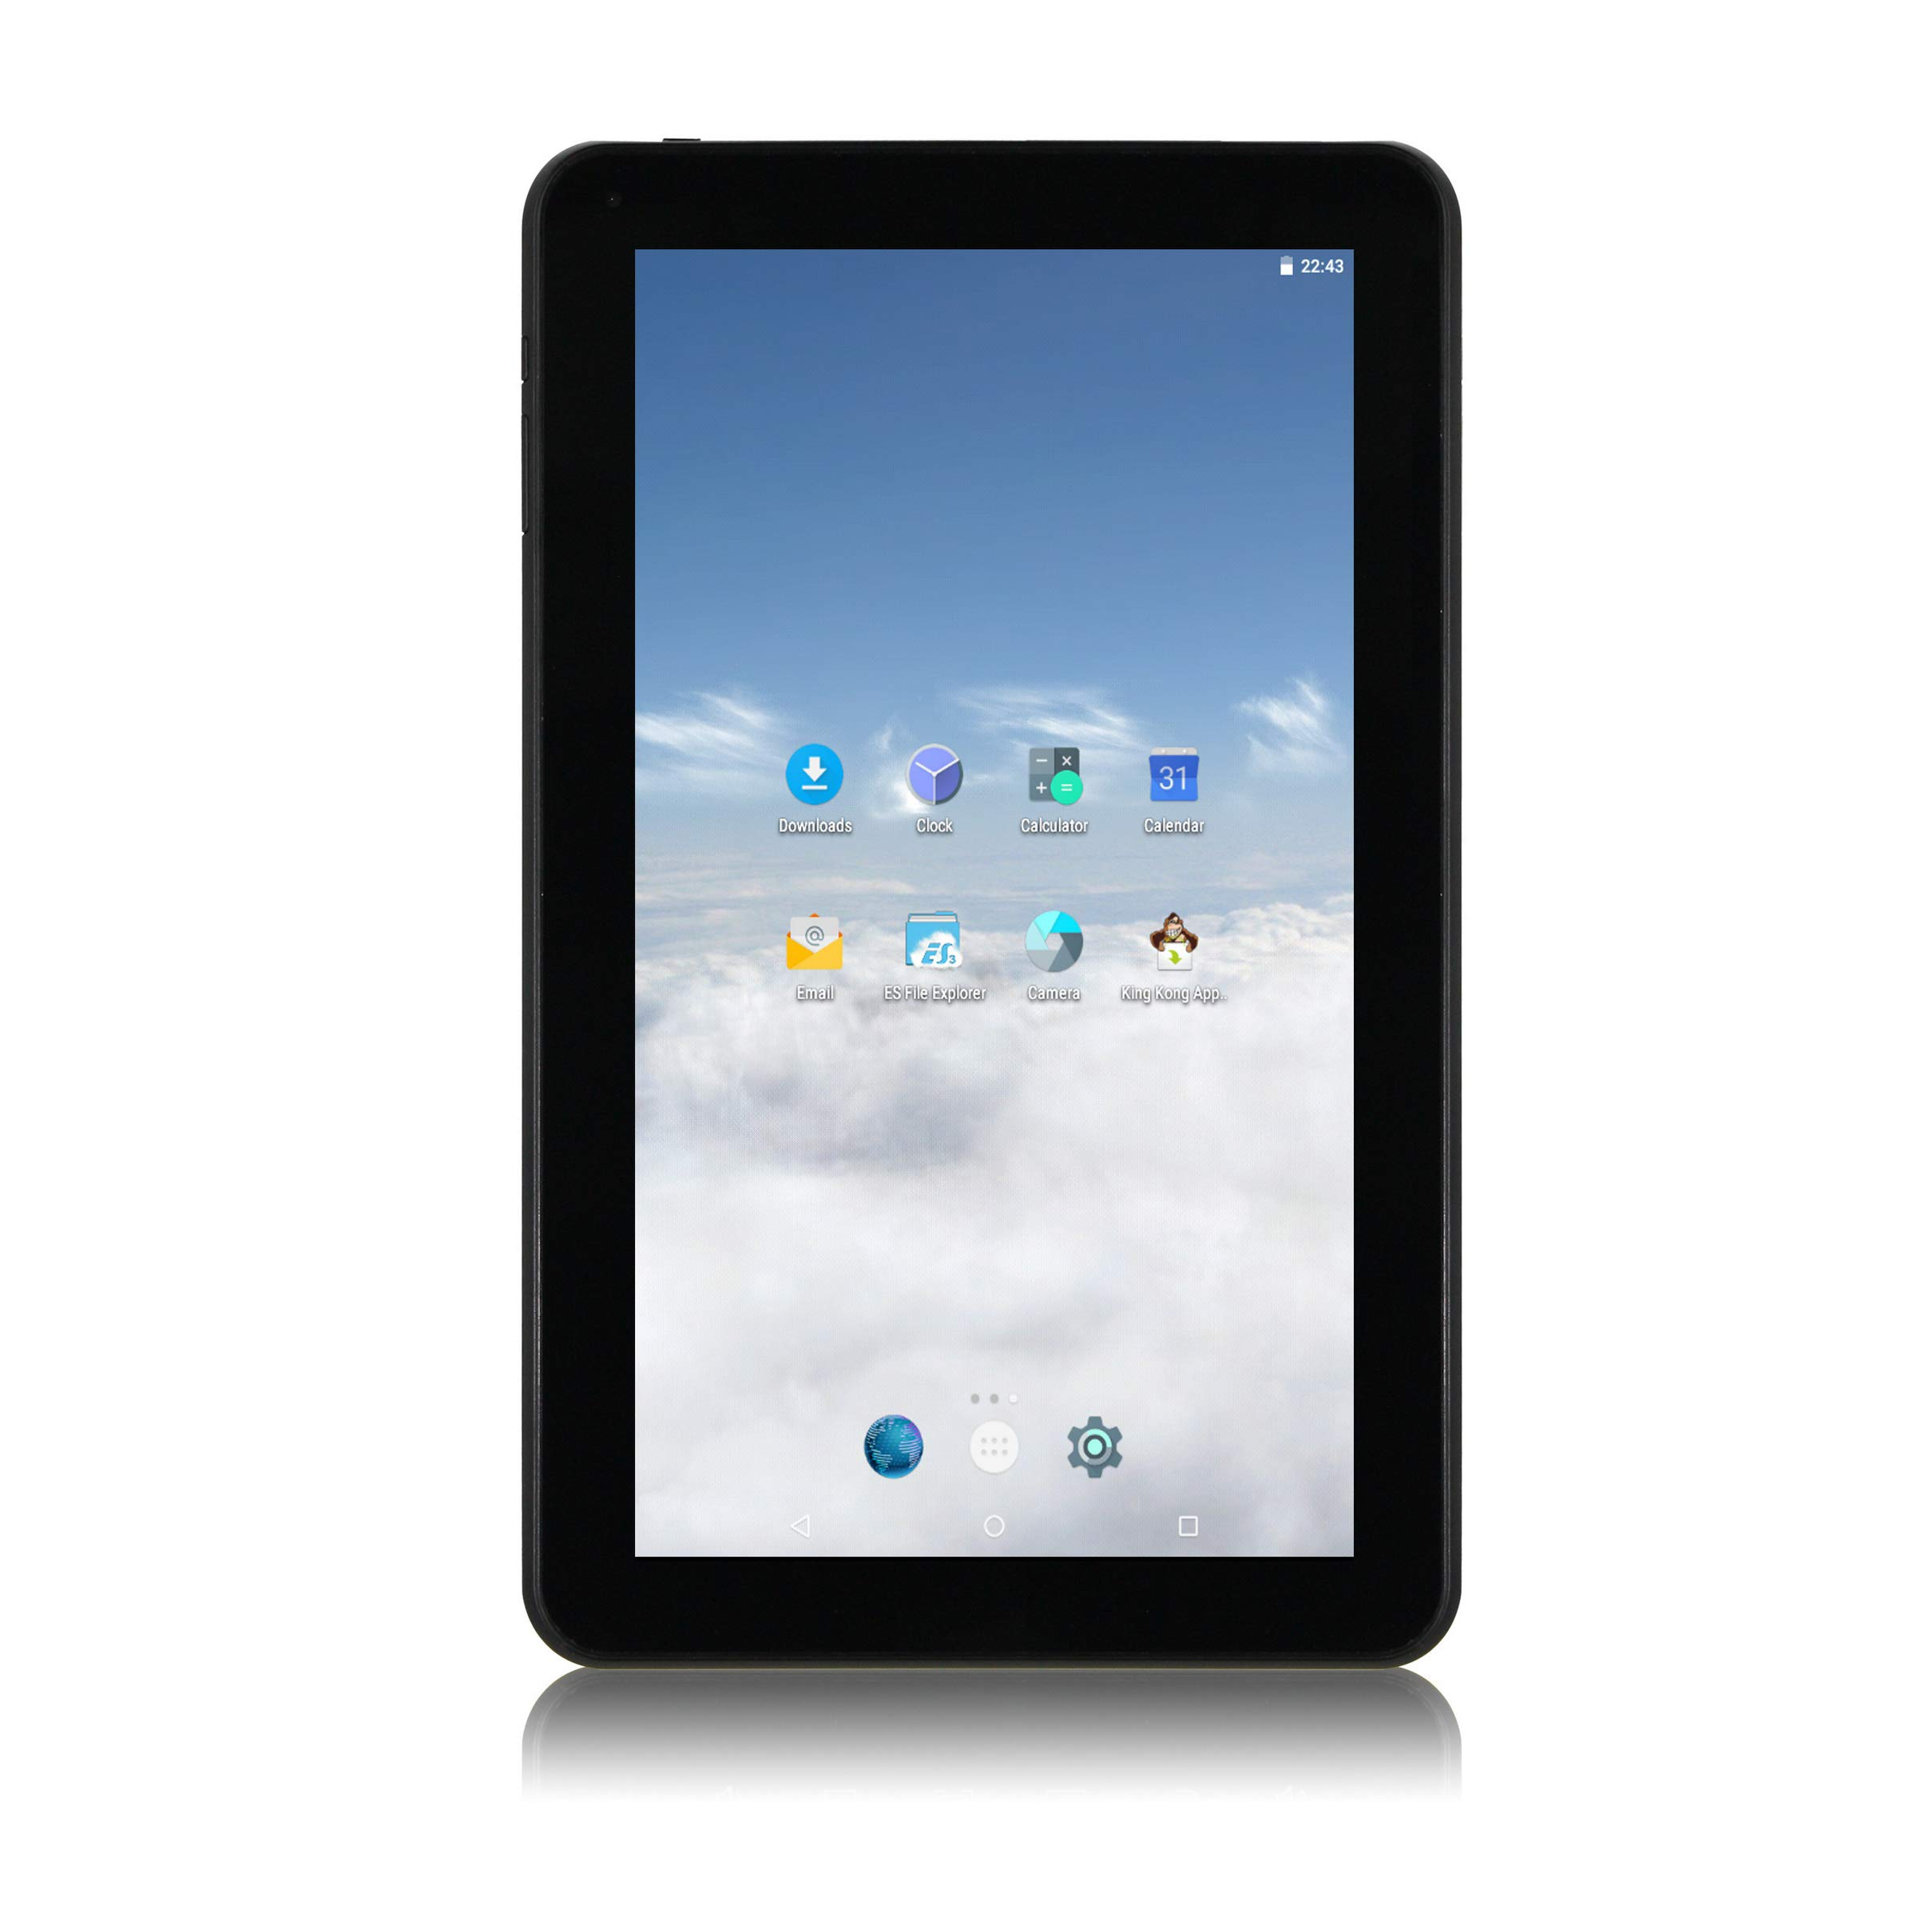 iView 1060TPCKBK Android Tablet Storage